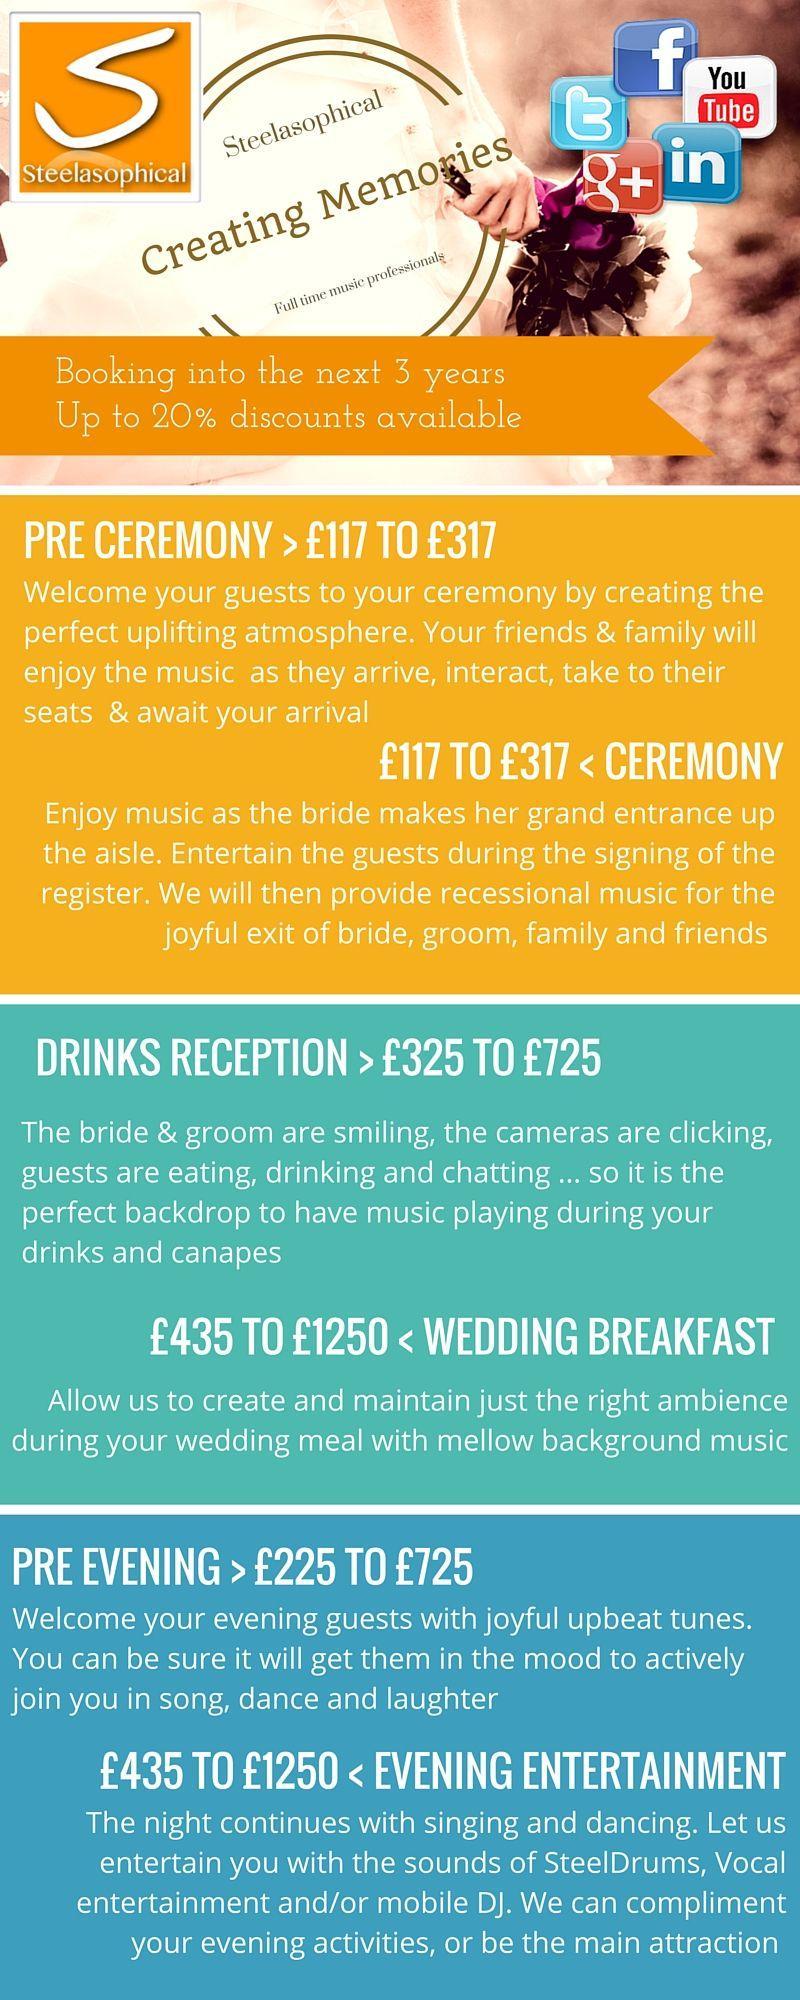 Longstowe Hall Wedding Steel Band for Hire